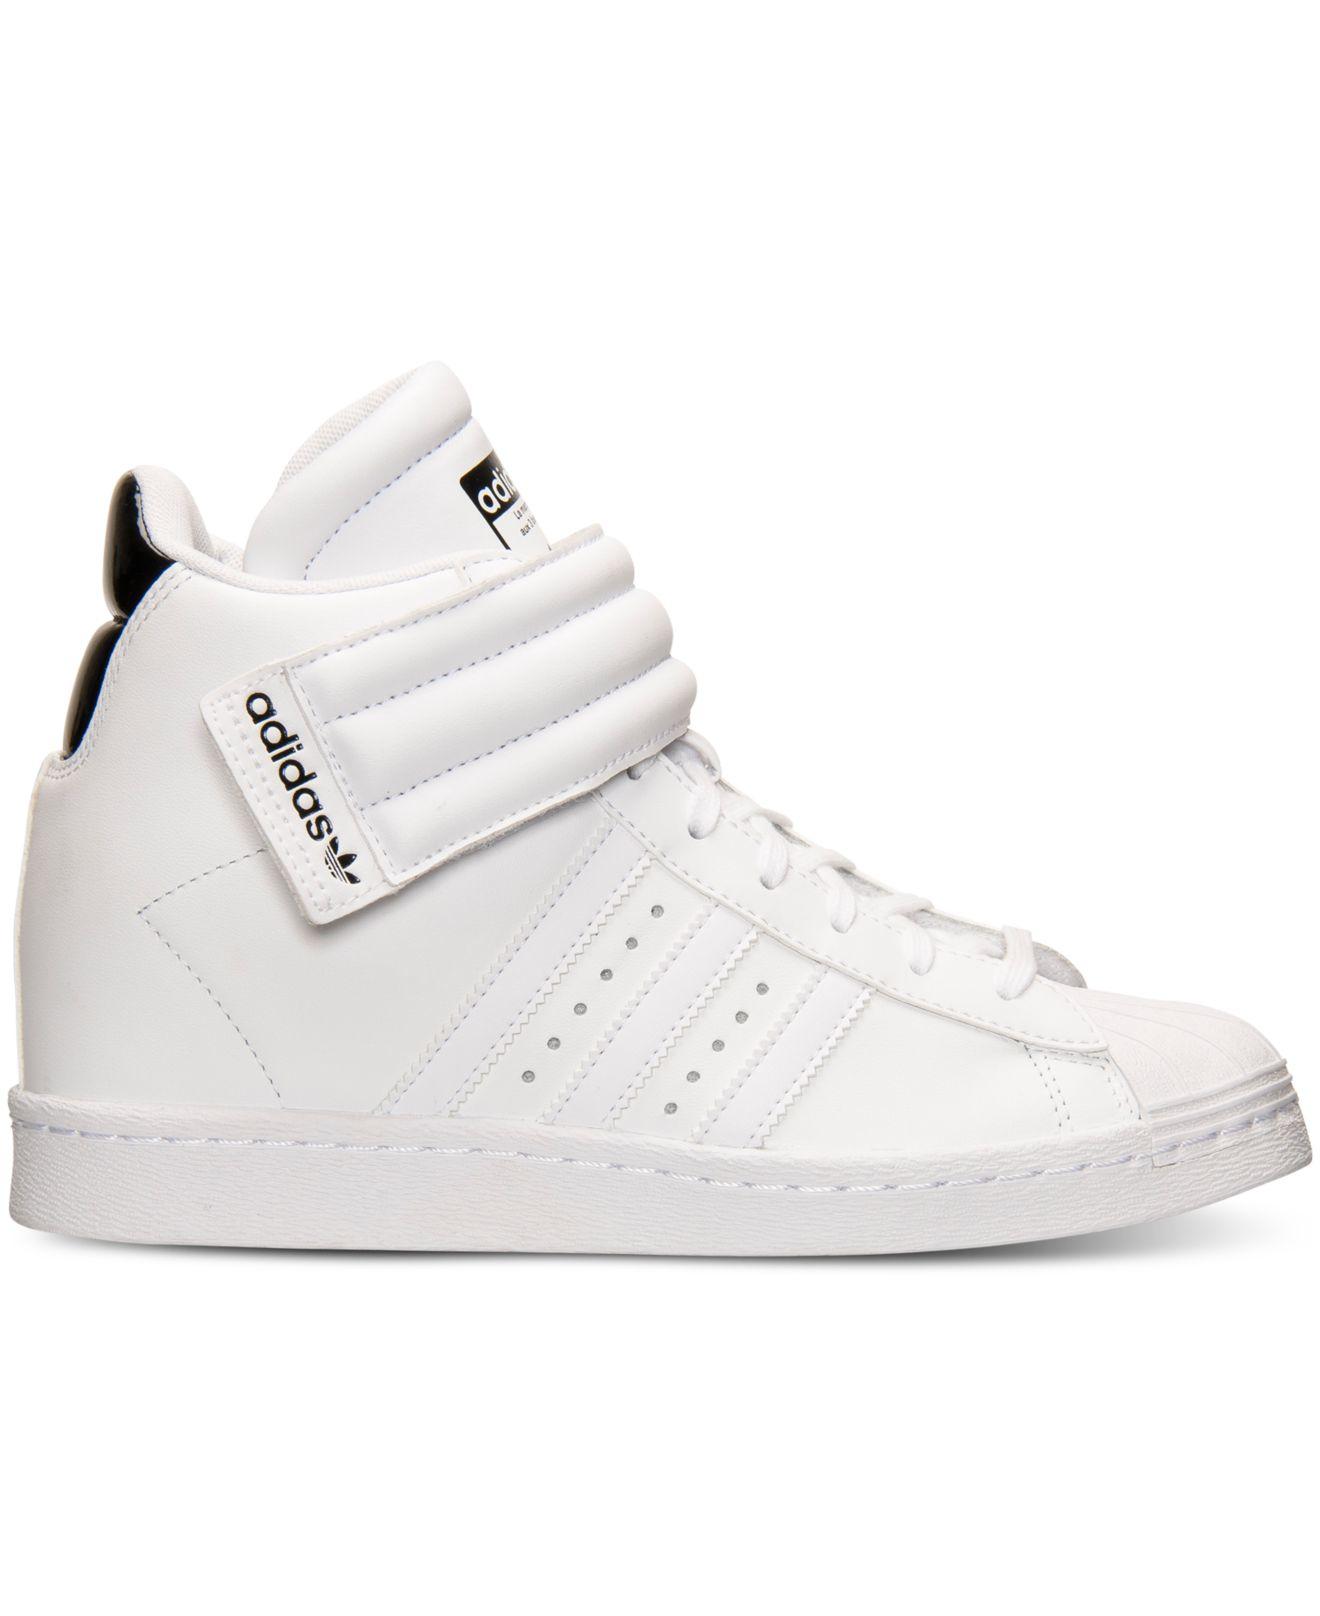 0184ef29af8f Lyst - adidas Originals Women s Superstar Up Strap Casual Sneakers ...